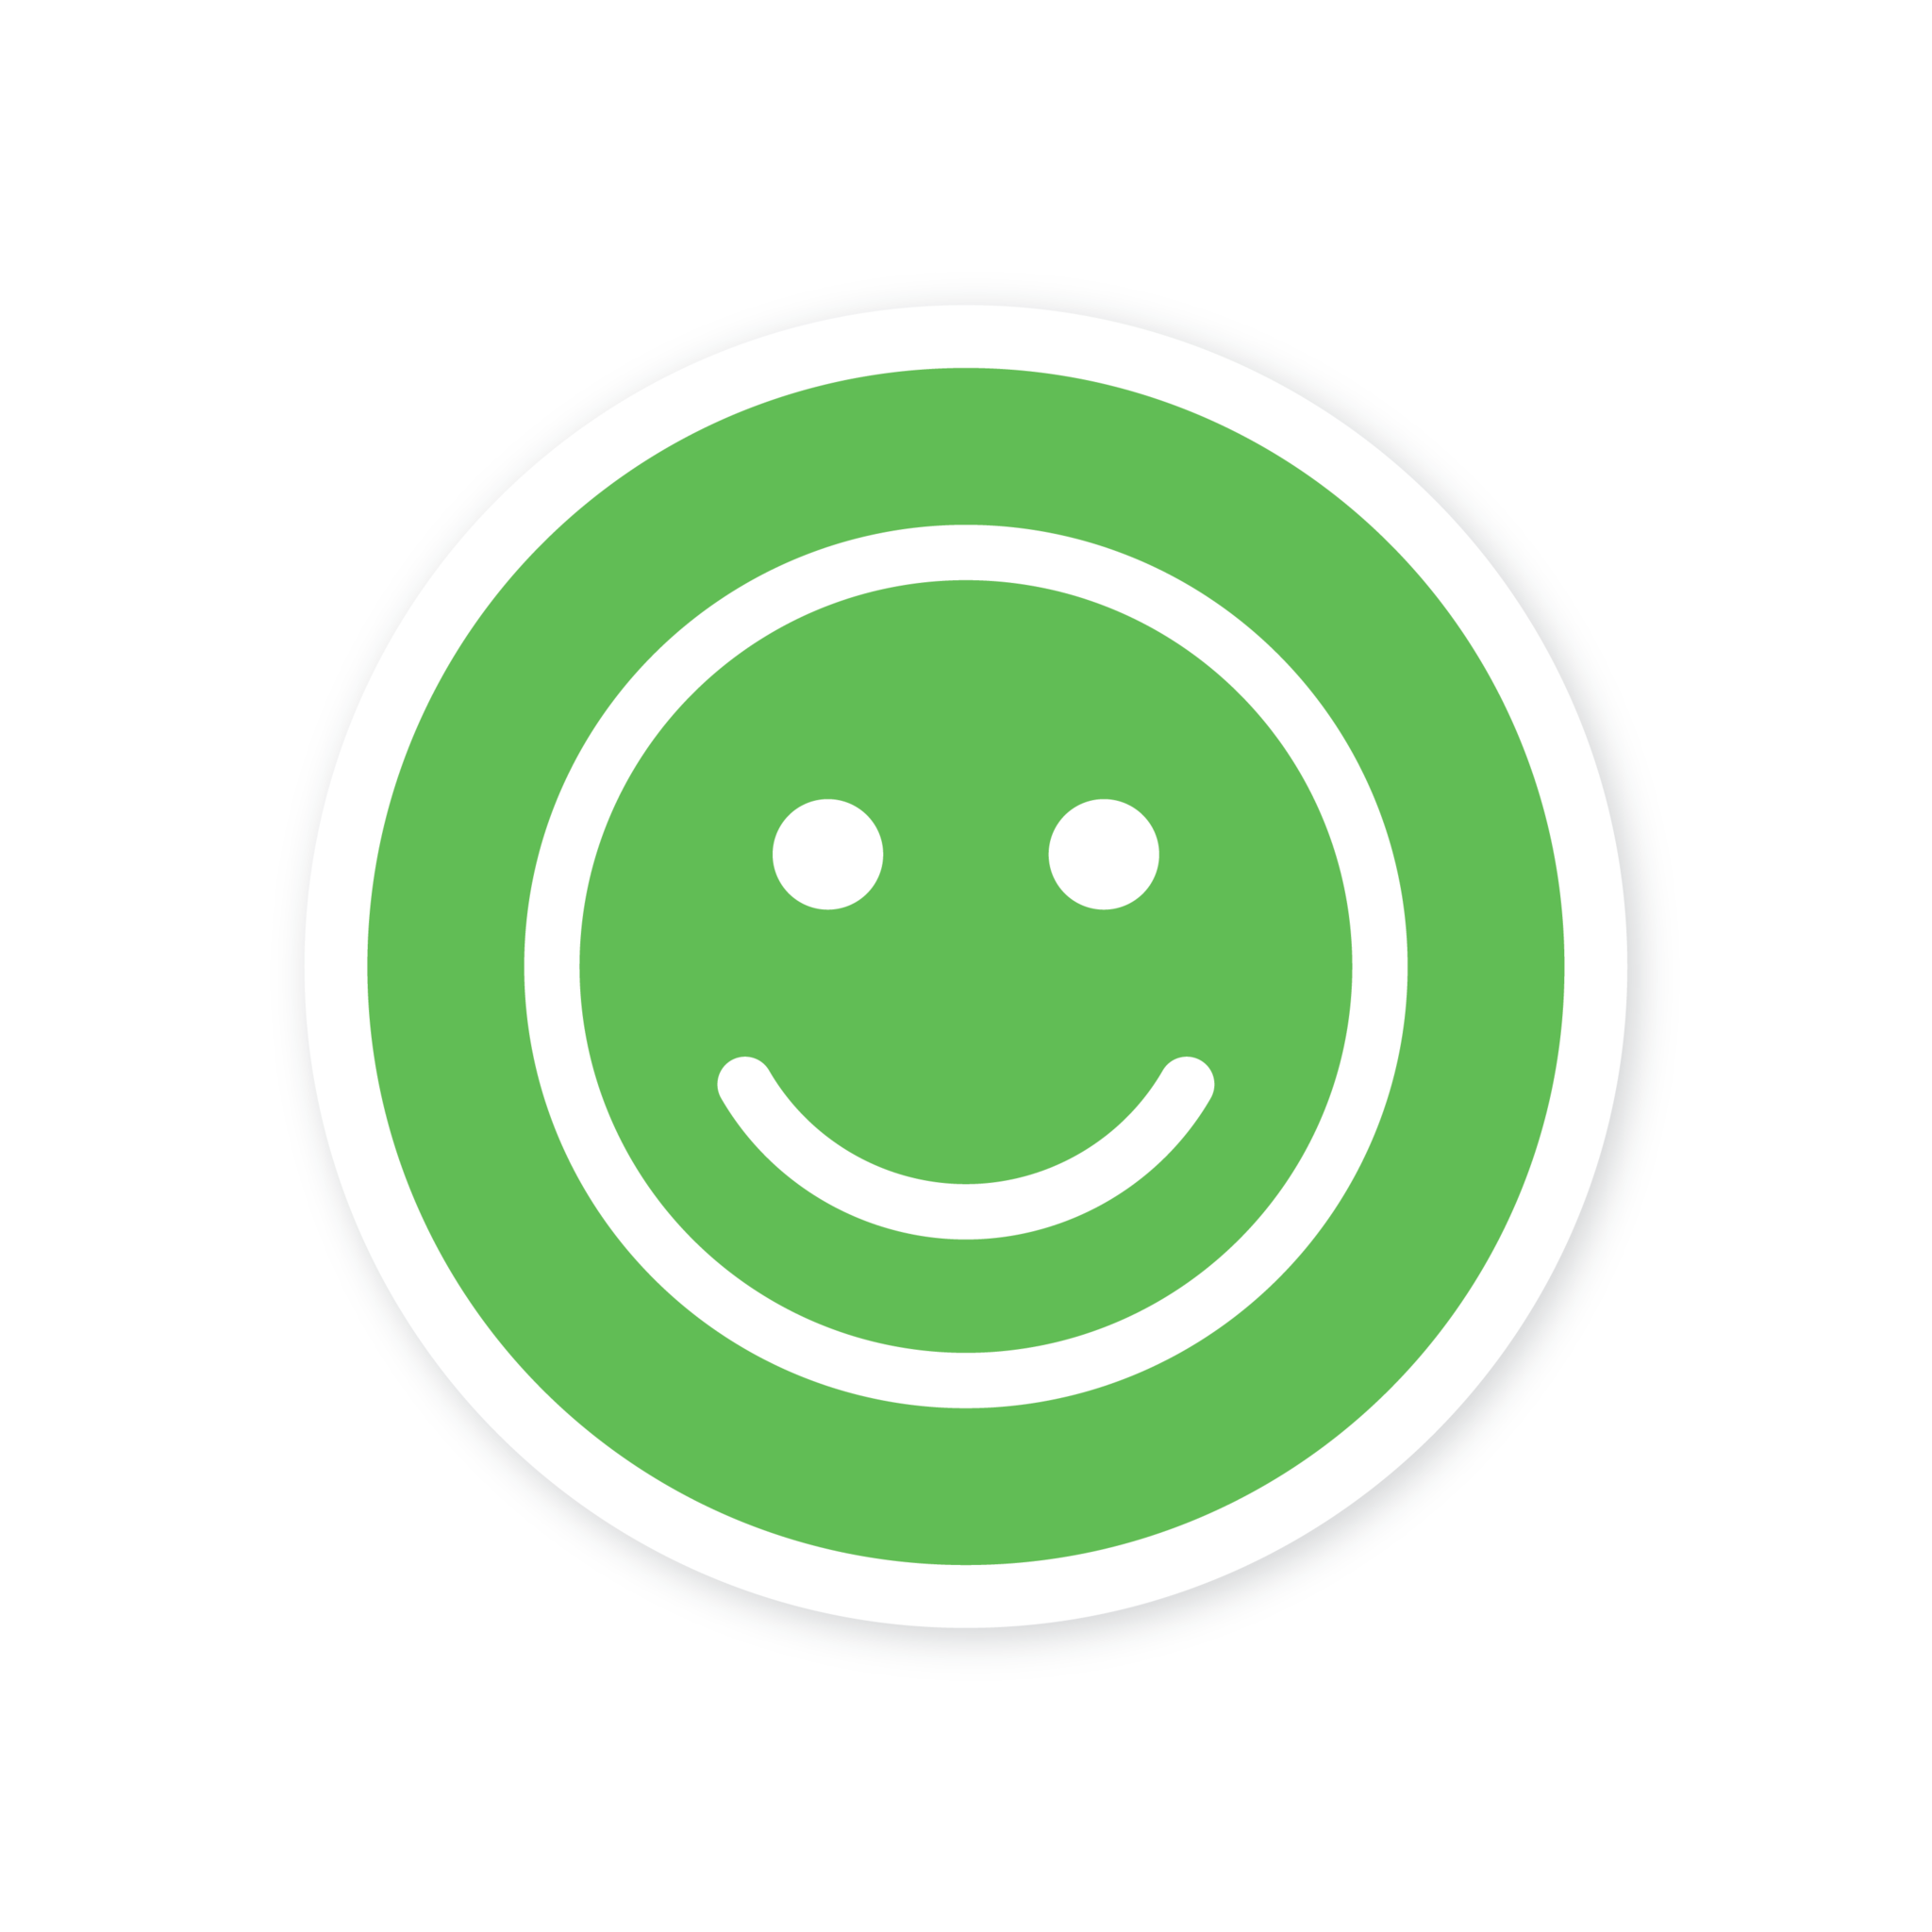 Easydot Wit Smiley verfügbare Aufkleberkorona